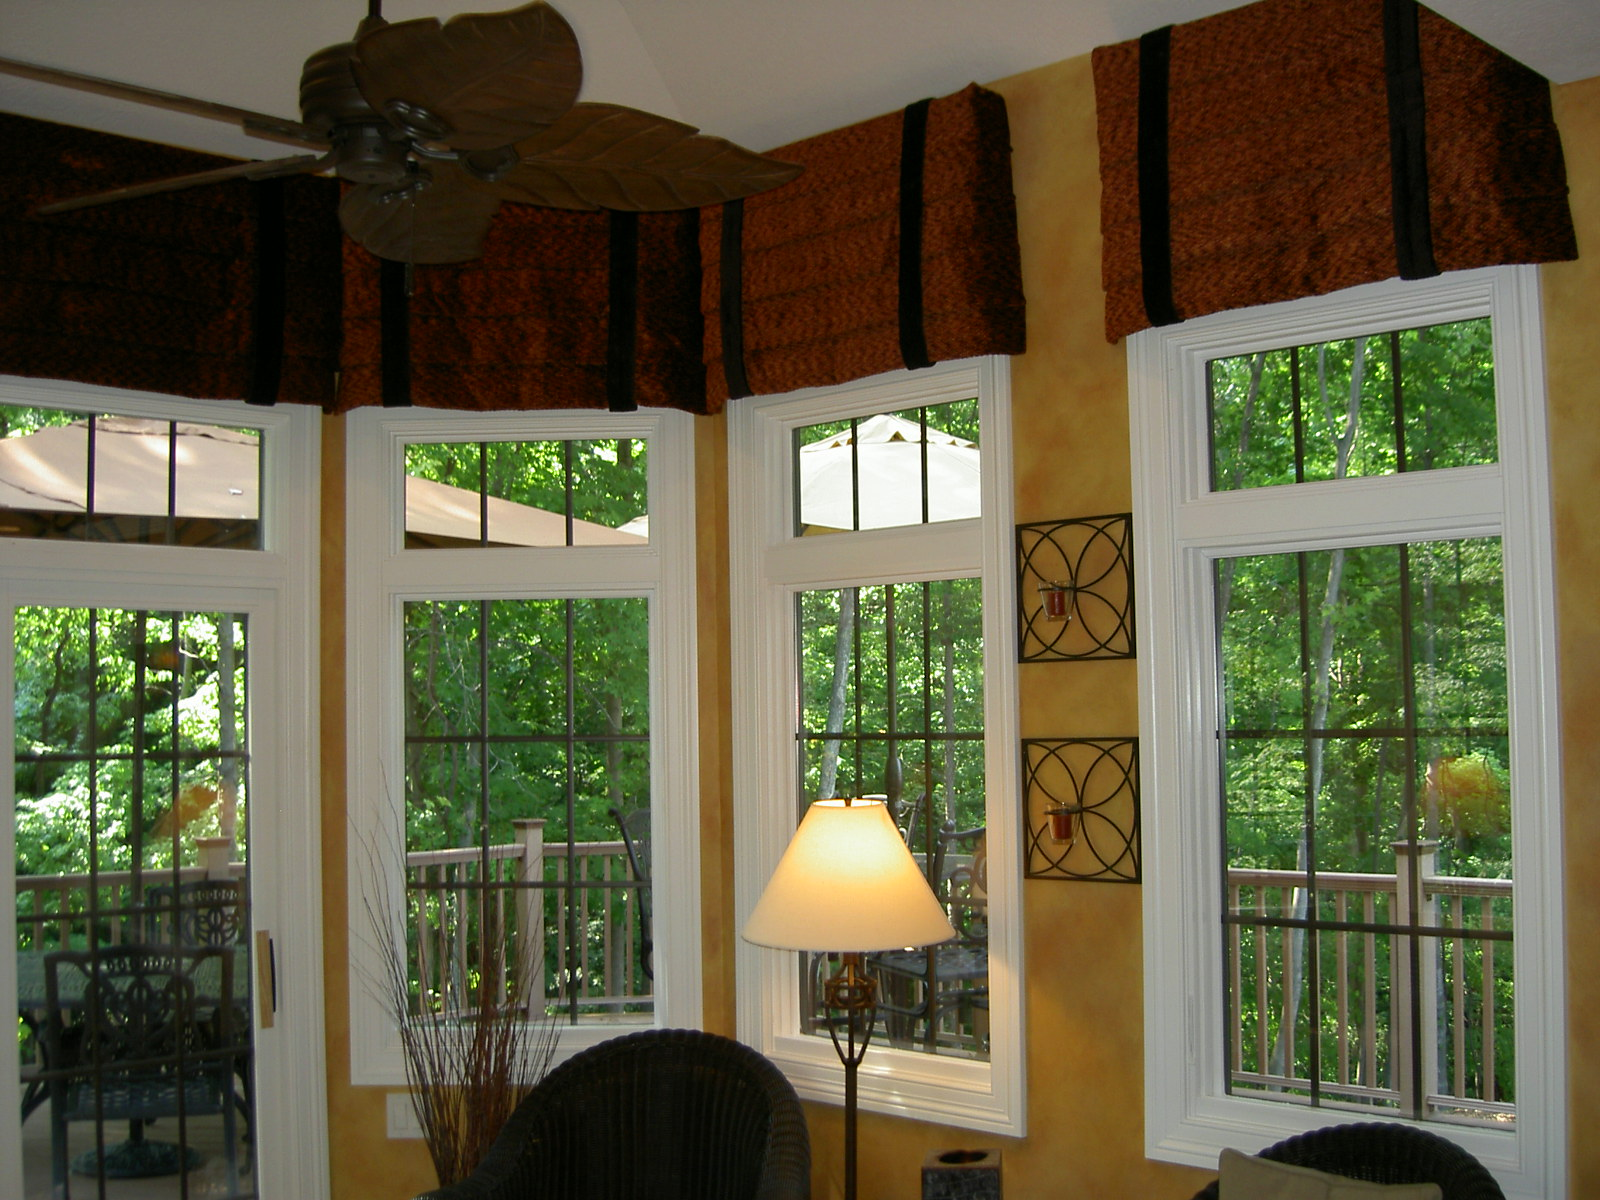 See our Drapery and Window Treatment Designs from our  : WindowTreatmentDiningRoomLatinaModelHomeHomeramaleftkitchenvalances from schindlersfabrics.com size 1600 x 1200 jpeg 440kB